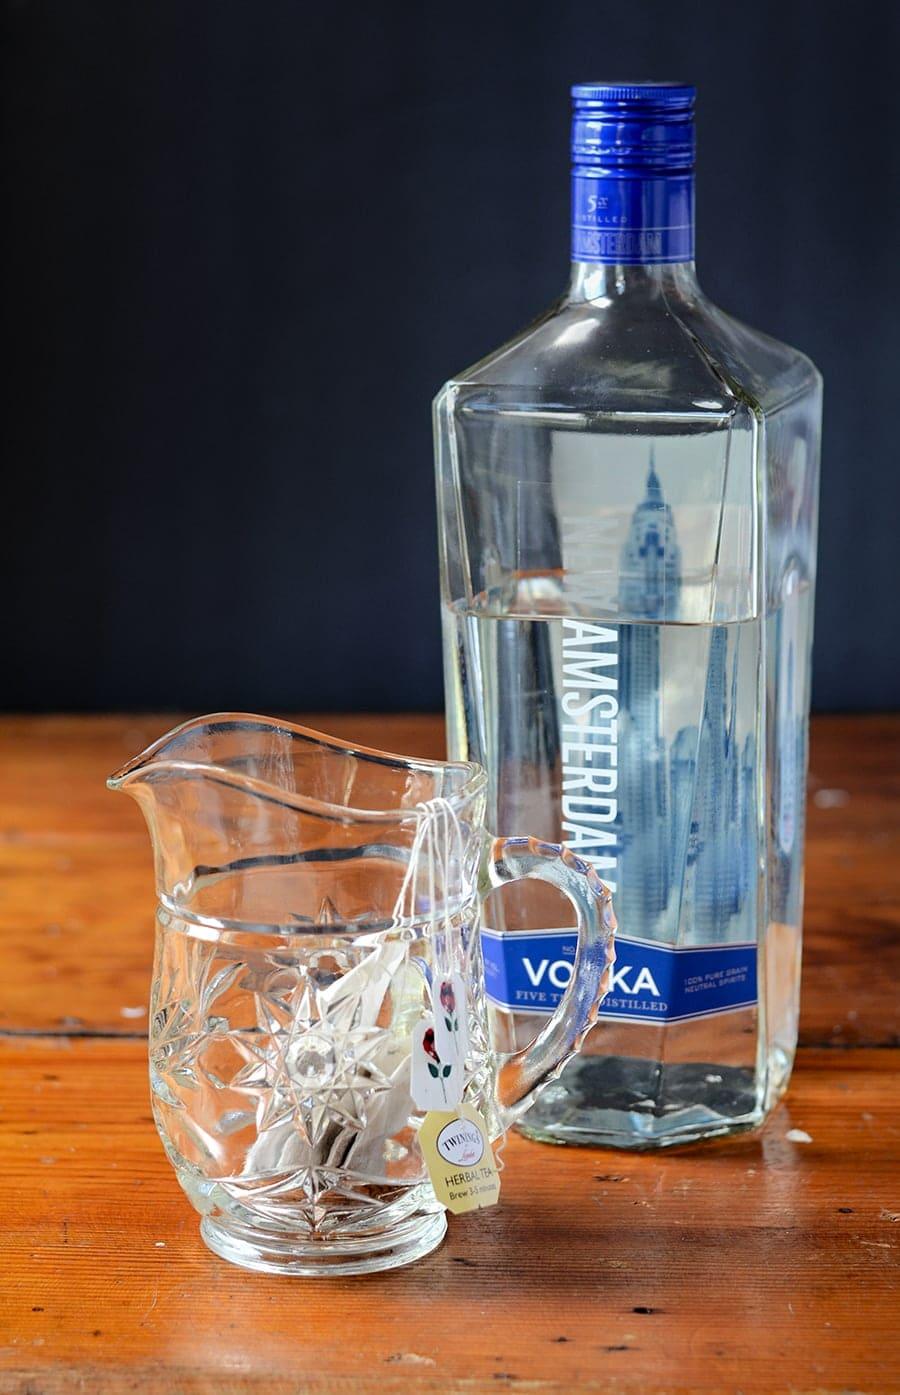 Making Tea Vodka Web - Skinny Iced Tea Cocktail </br>with Homemade Unsweetened Tea Vodka